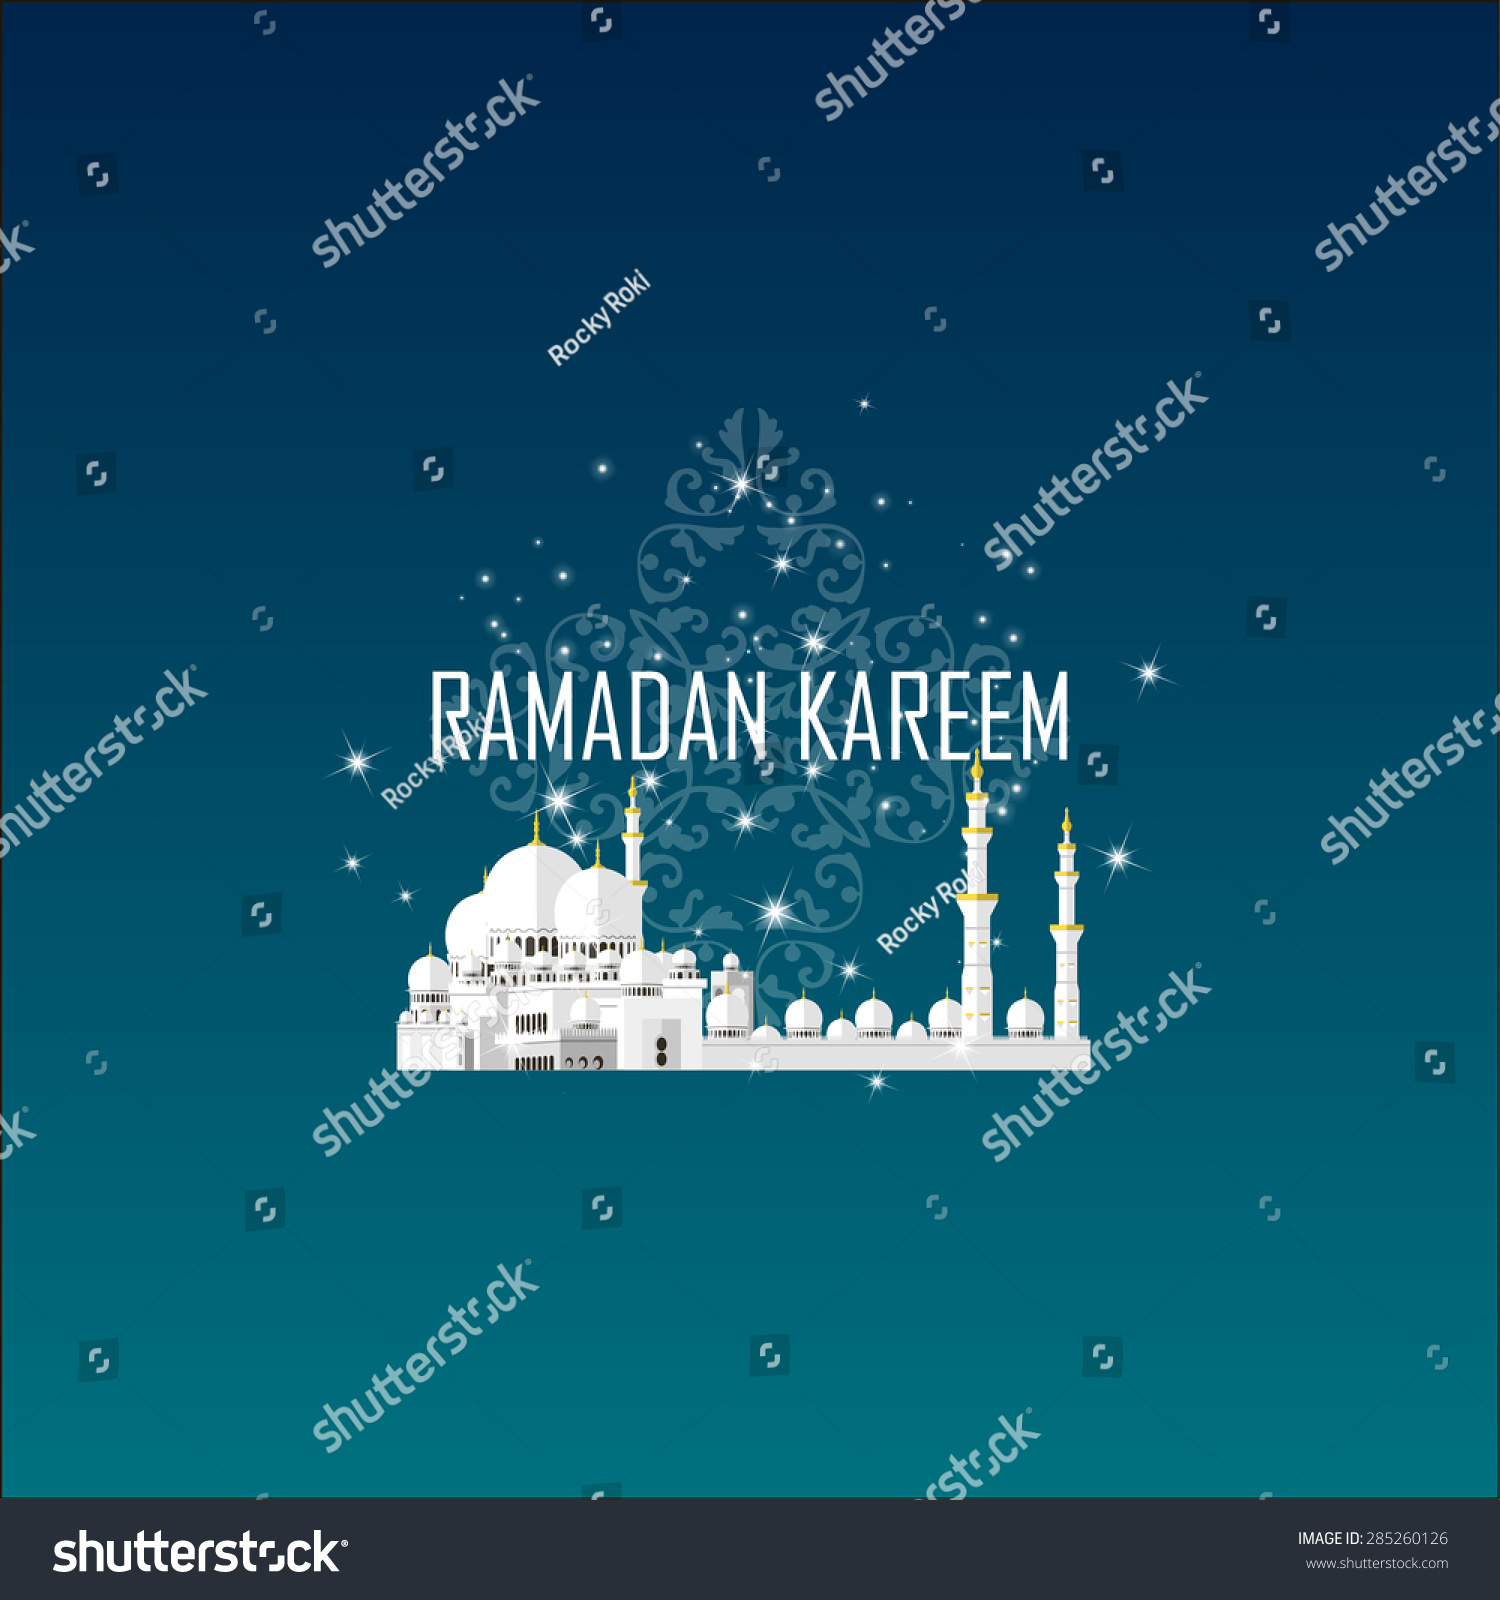 Ramadan kareem greeting cards muslim background stock vector ramadan kareem greeting cards muslim background mosque and moon with stars vector illustration m4hsunfo